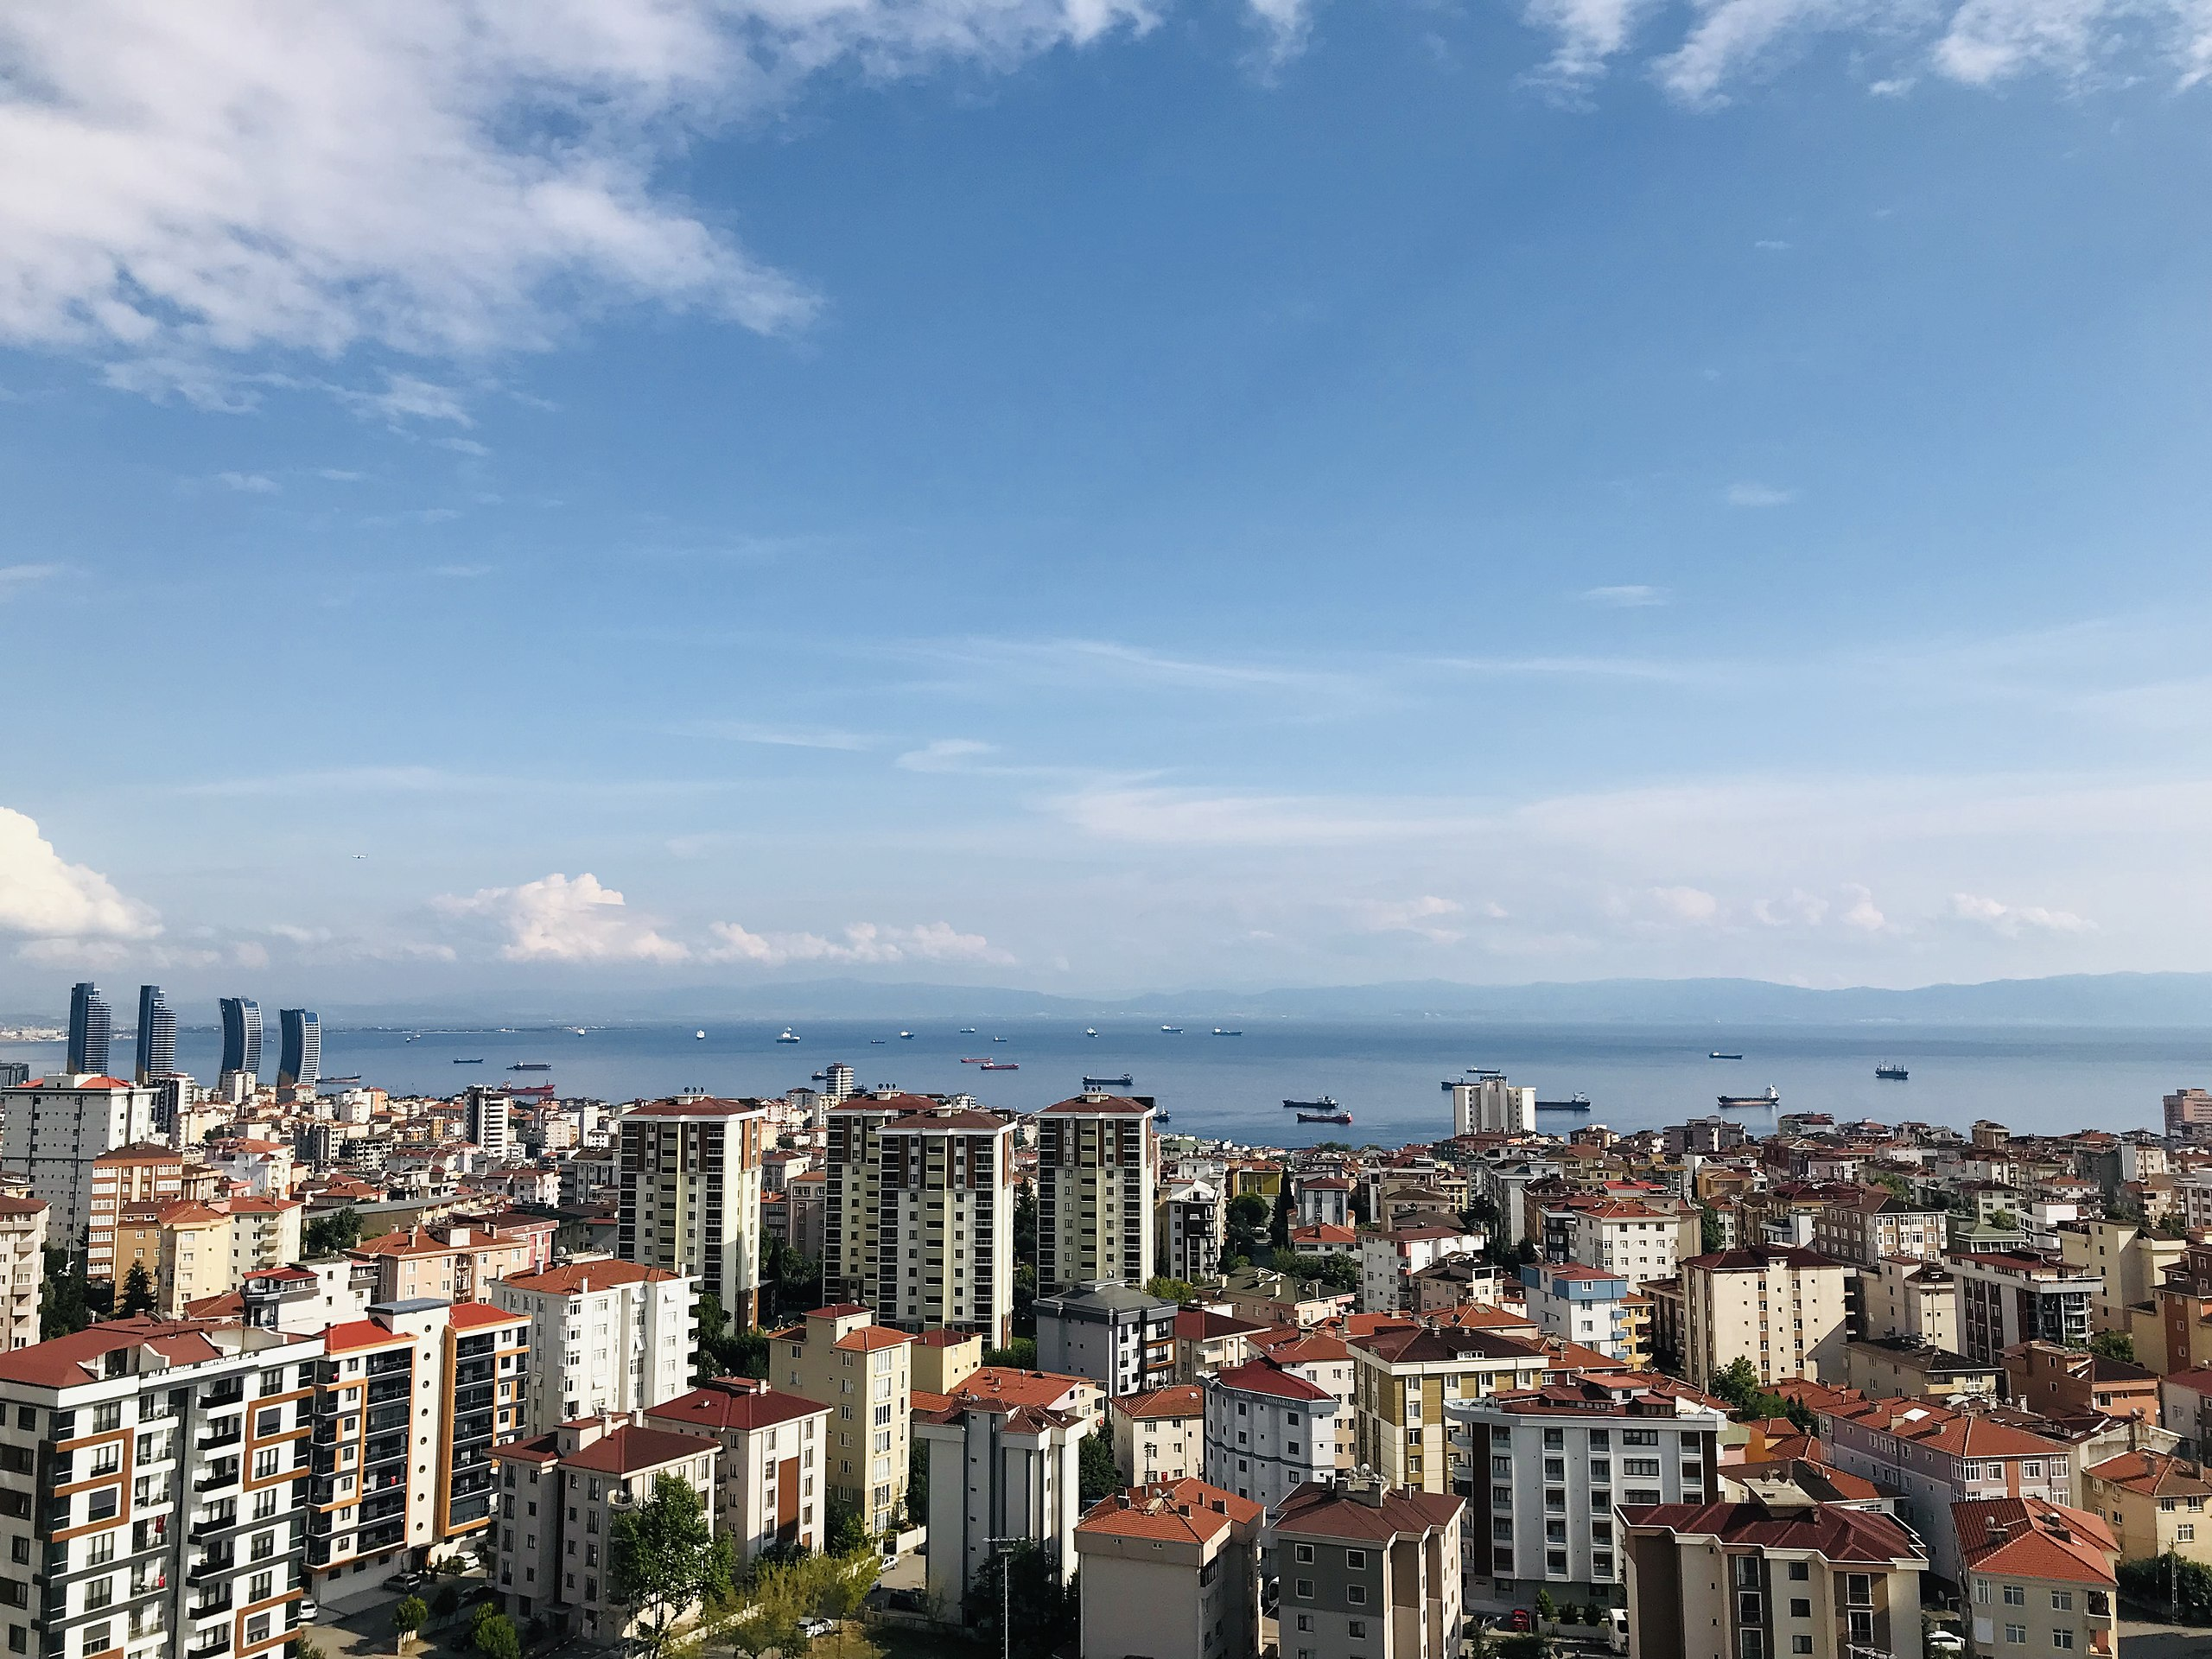 File:Skyline of District of Kartal, Istanbul.jpg - Wikimedia Commons